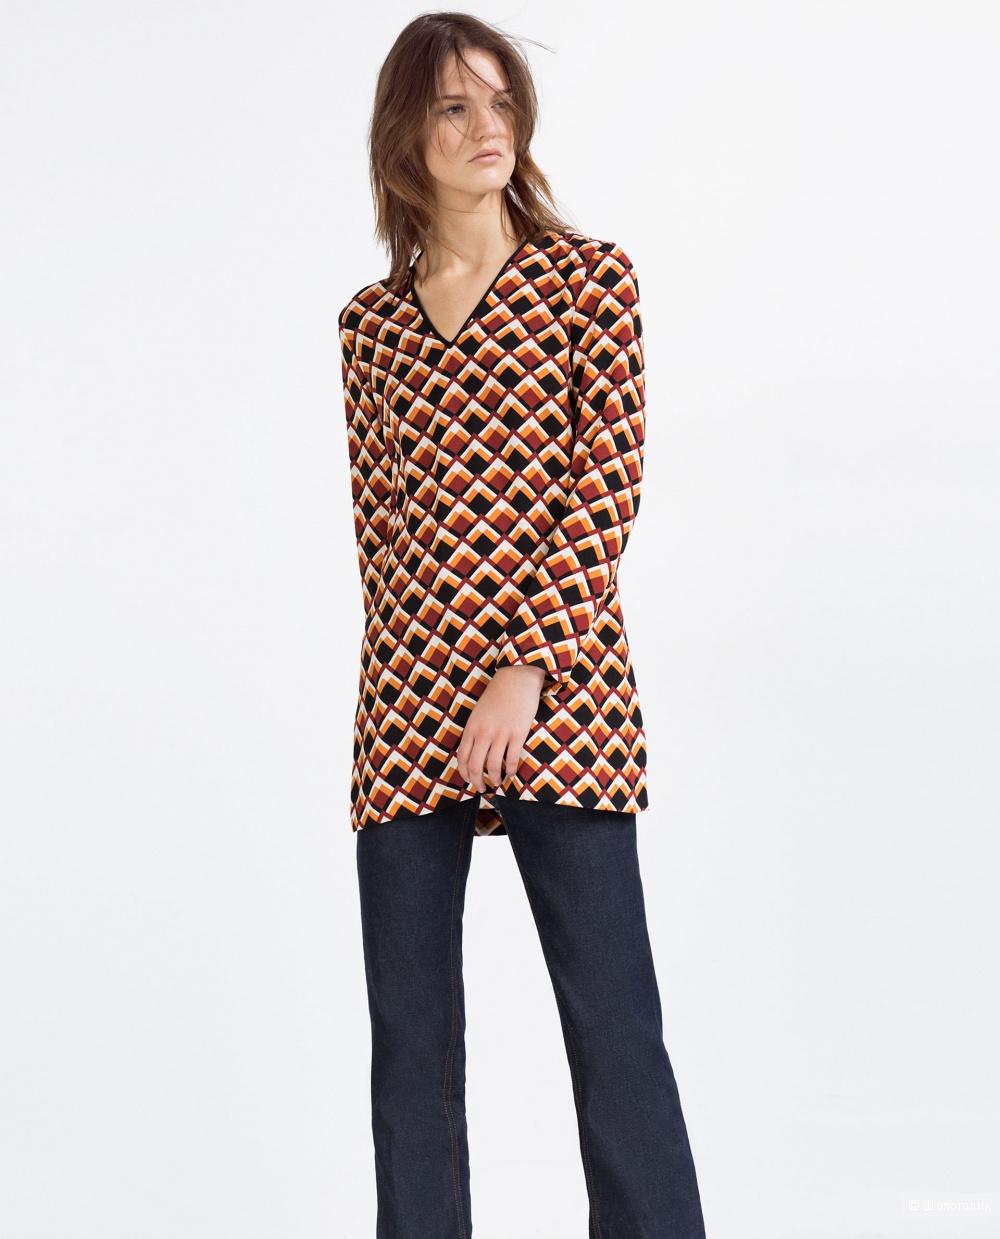 Zara women блузка туника размер S